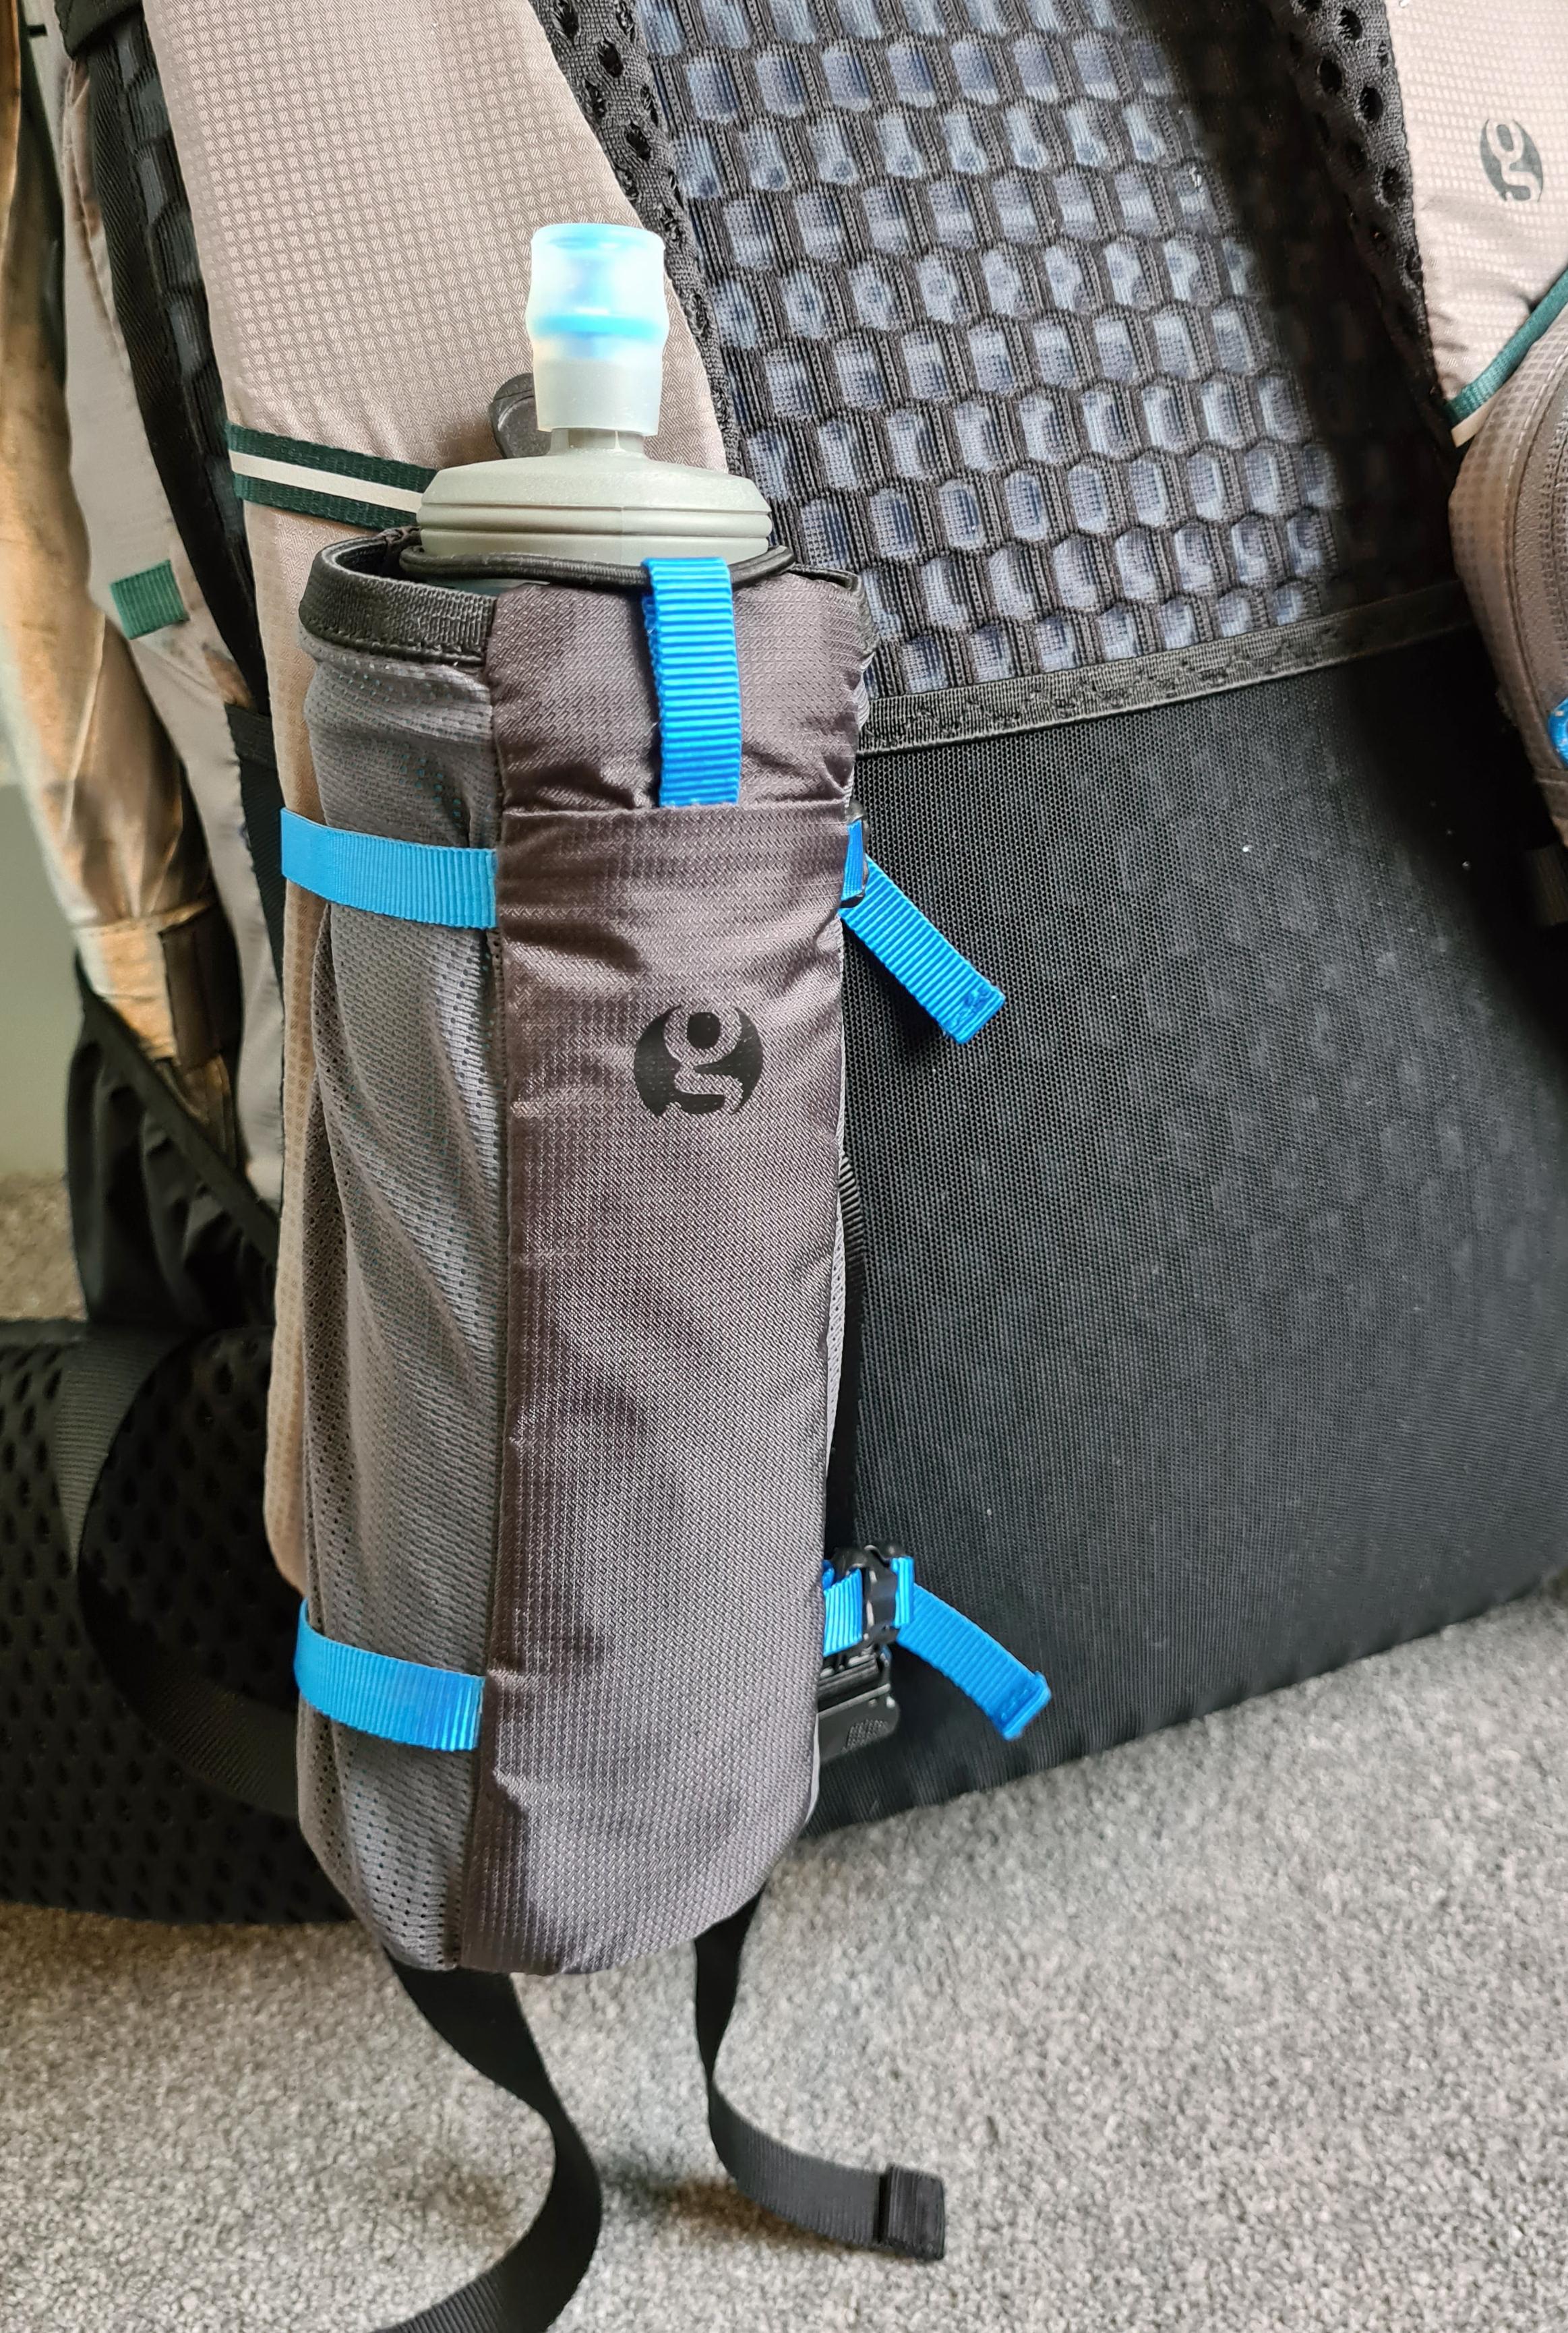 600ml HydraPak Ultraflask in Gossamer Gear Bottle Rocket shoulder strap bottle holder